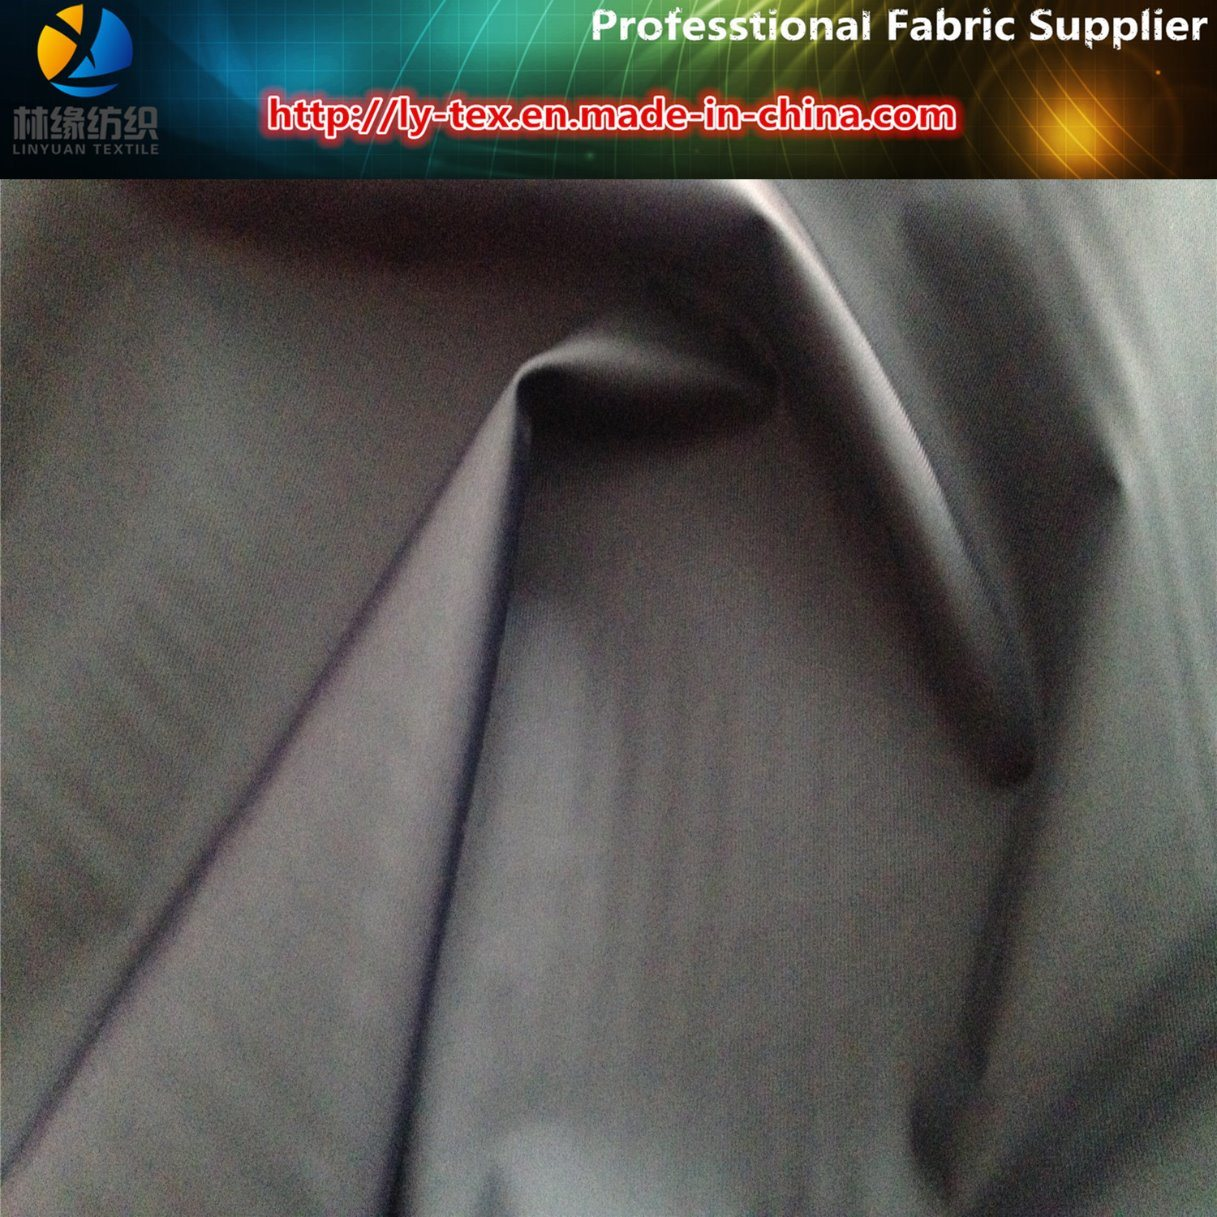 210d Nylon Oxford Fabric, 116t Nylon Oxford with Coating for Raincoat, Nylon Fabric